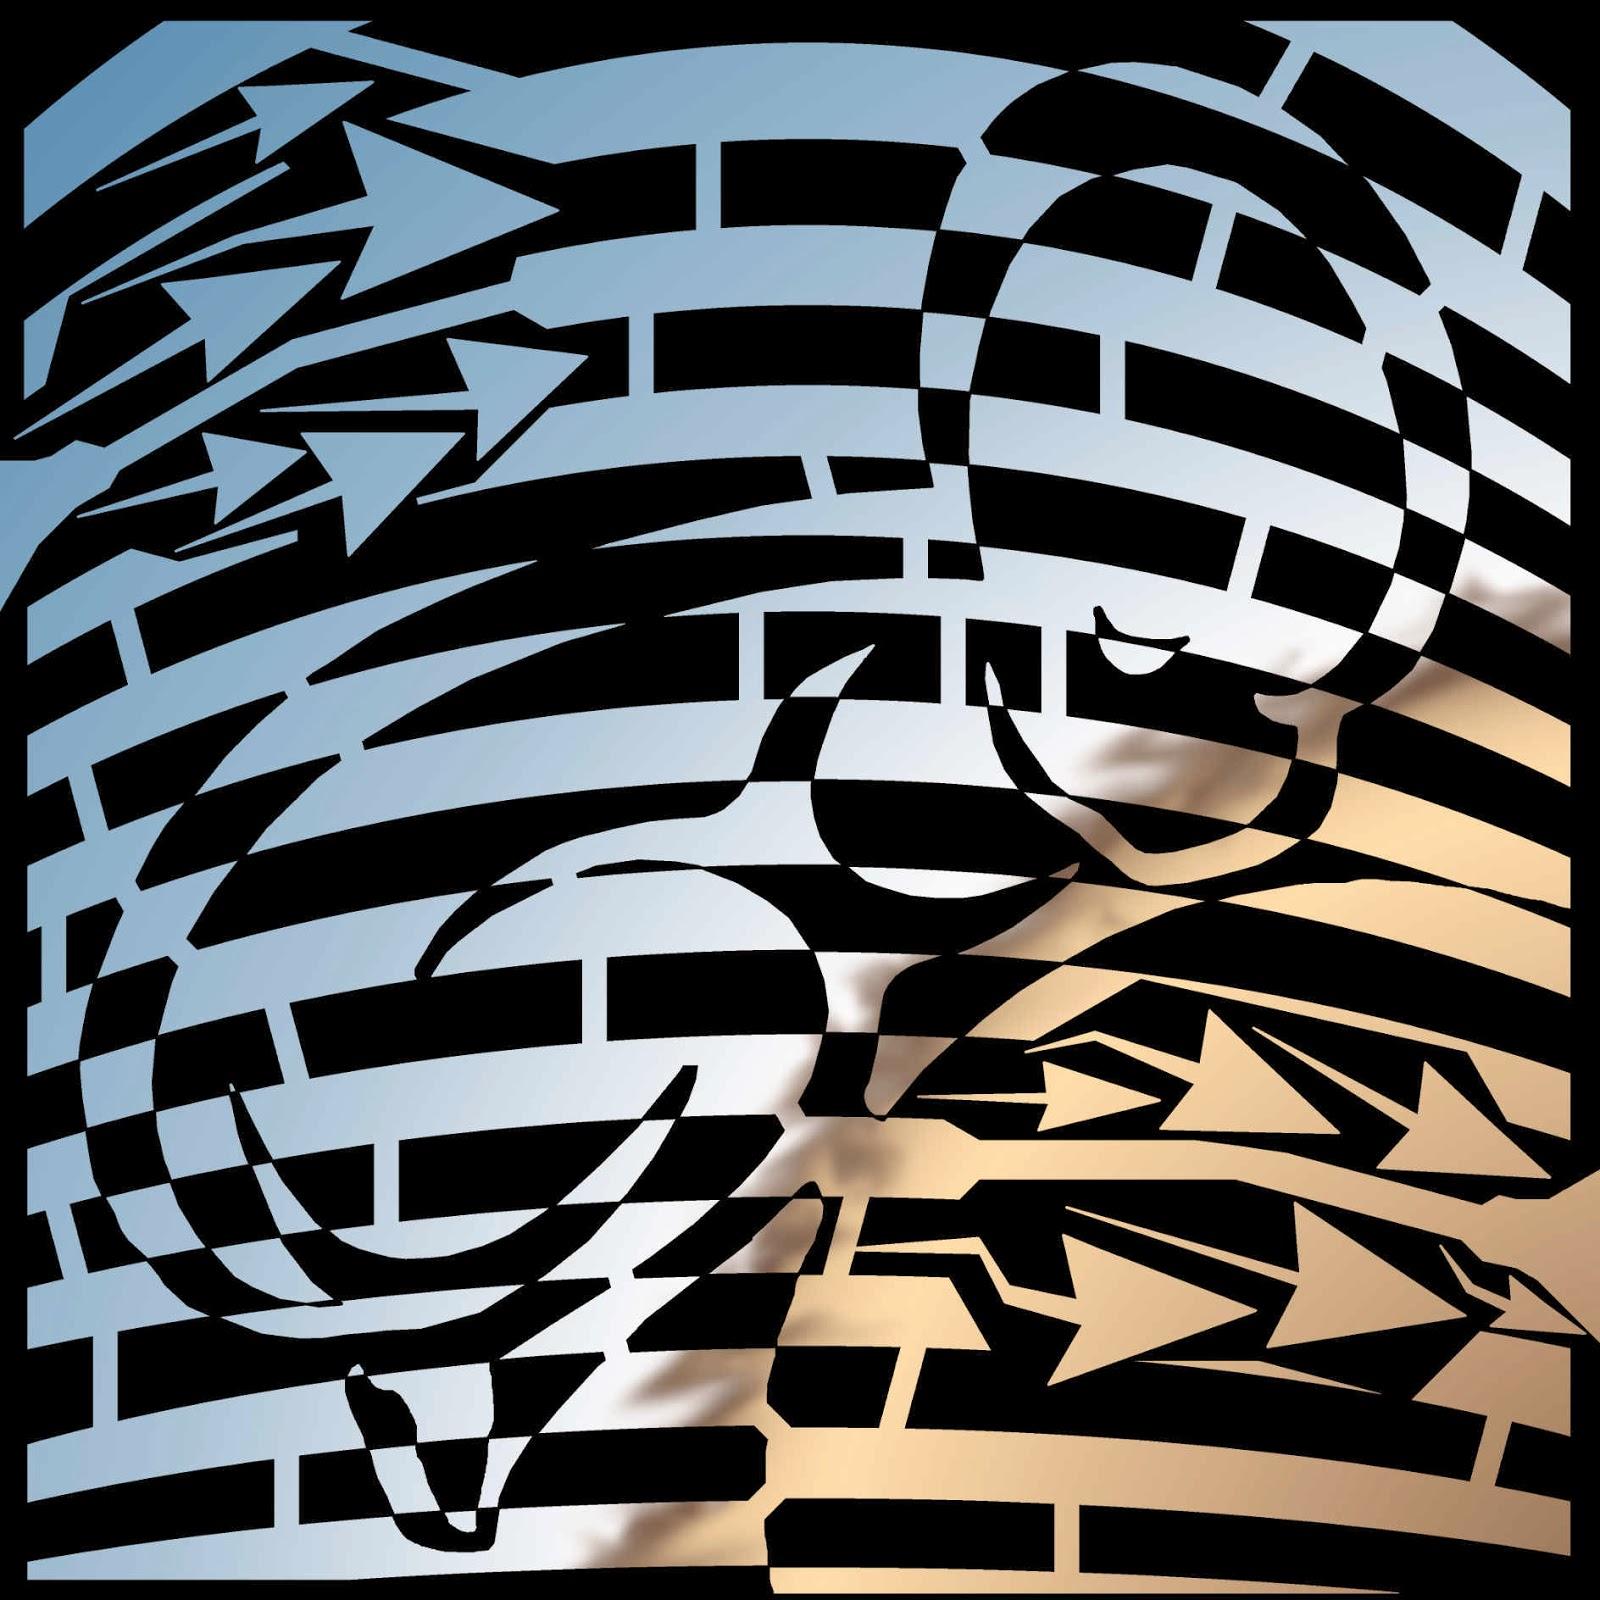 Rushin Roulette Op Art Baby Maze